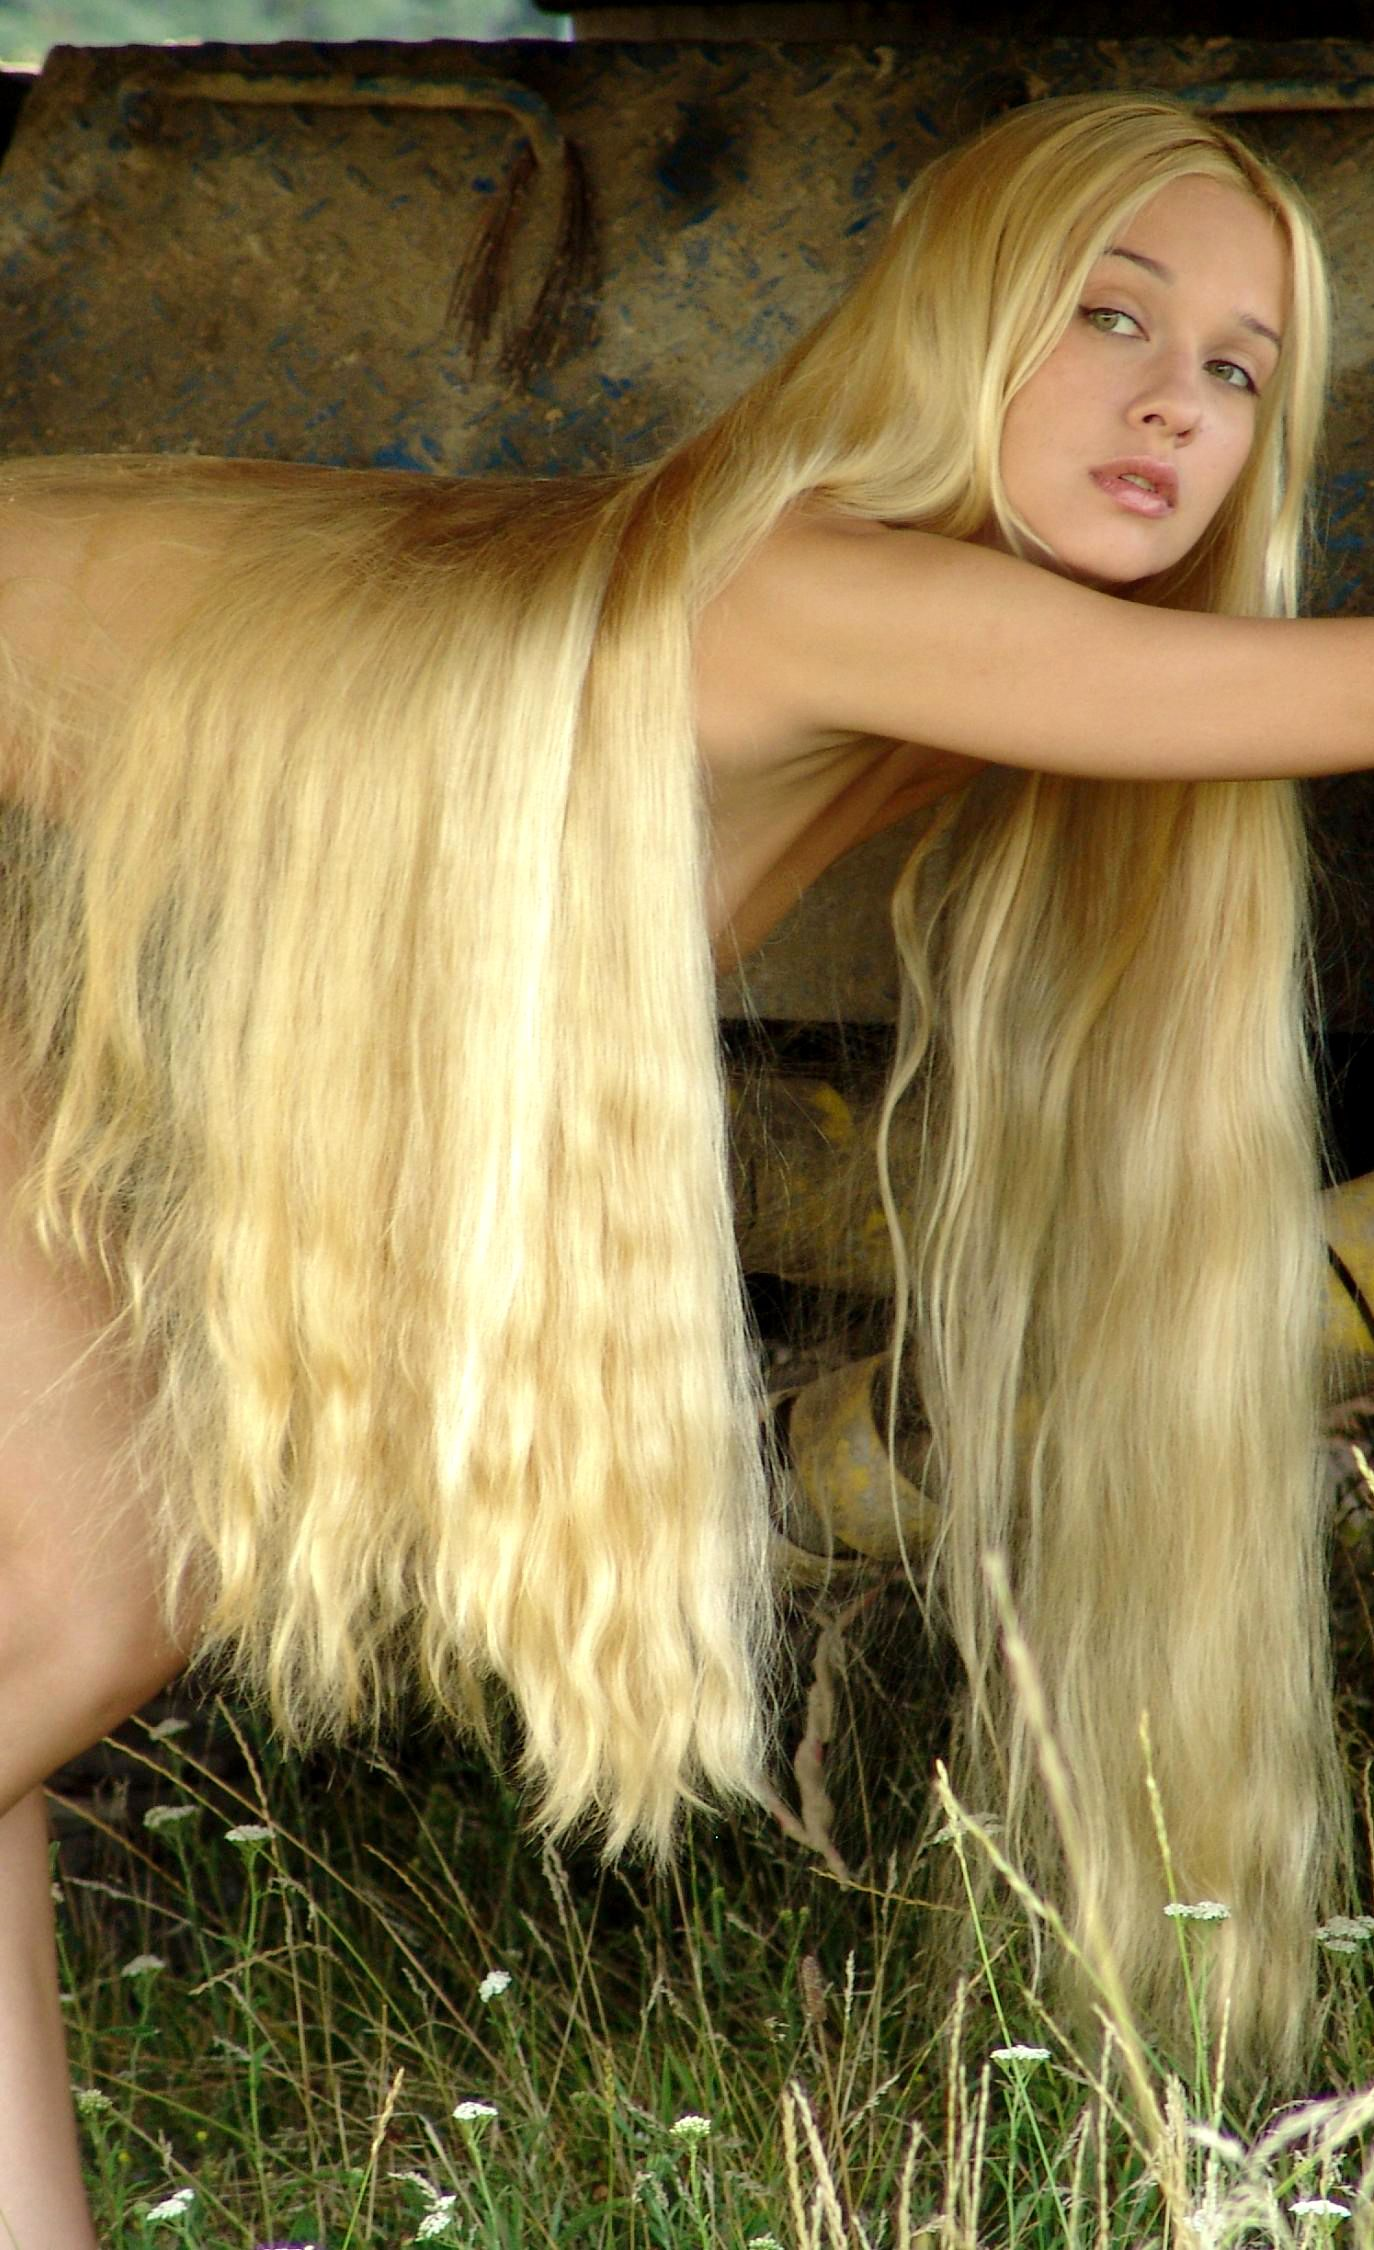 beautiful nude women with very long hair